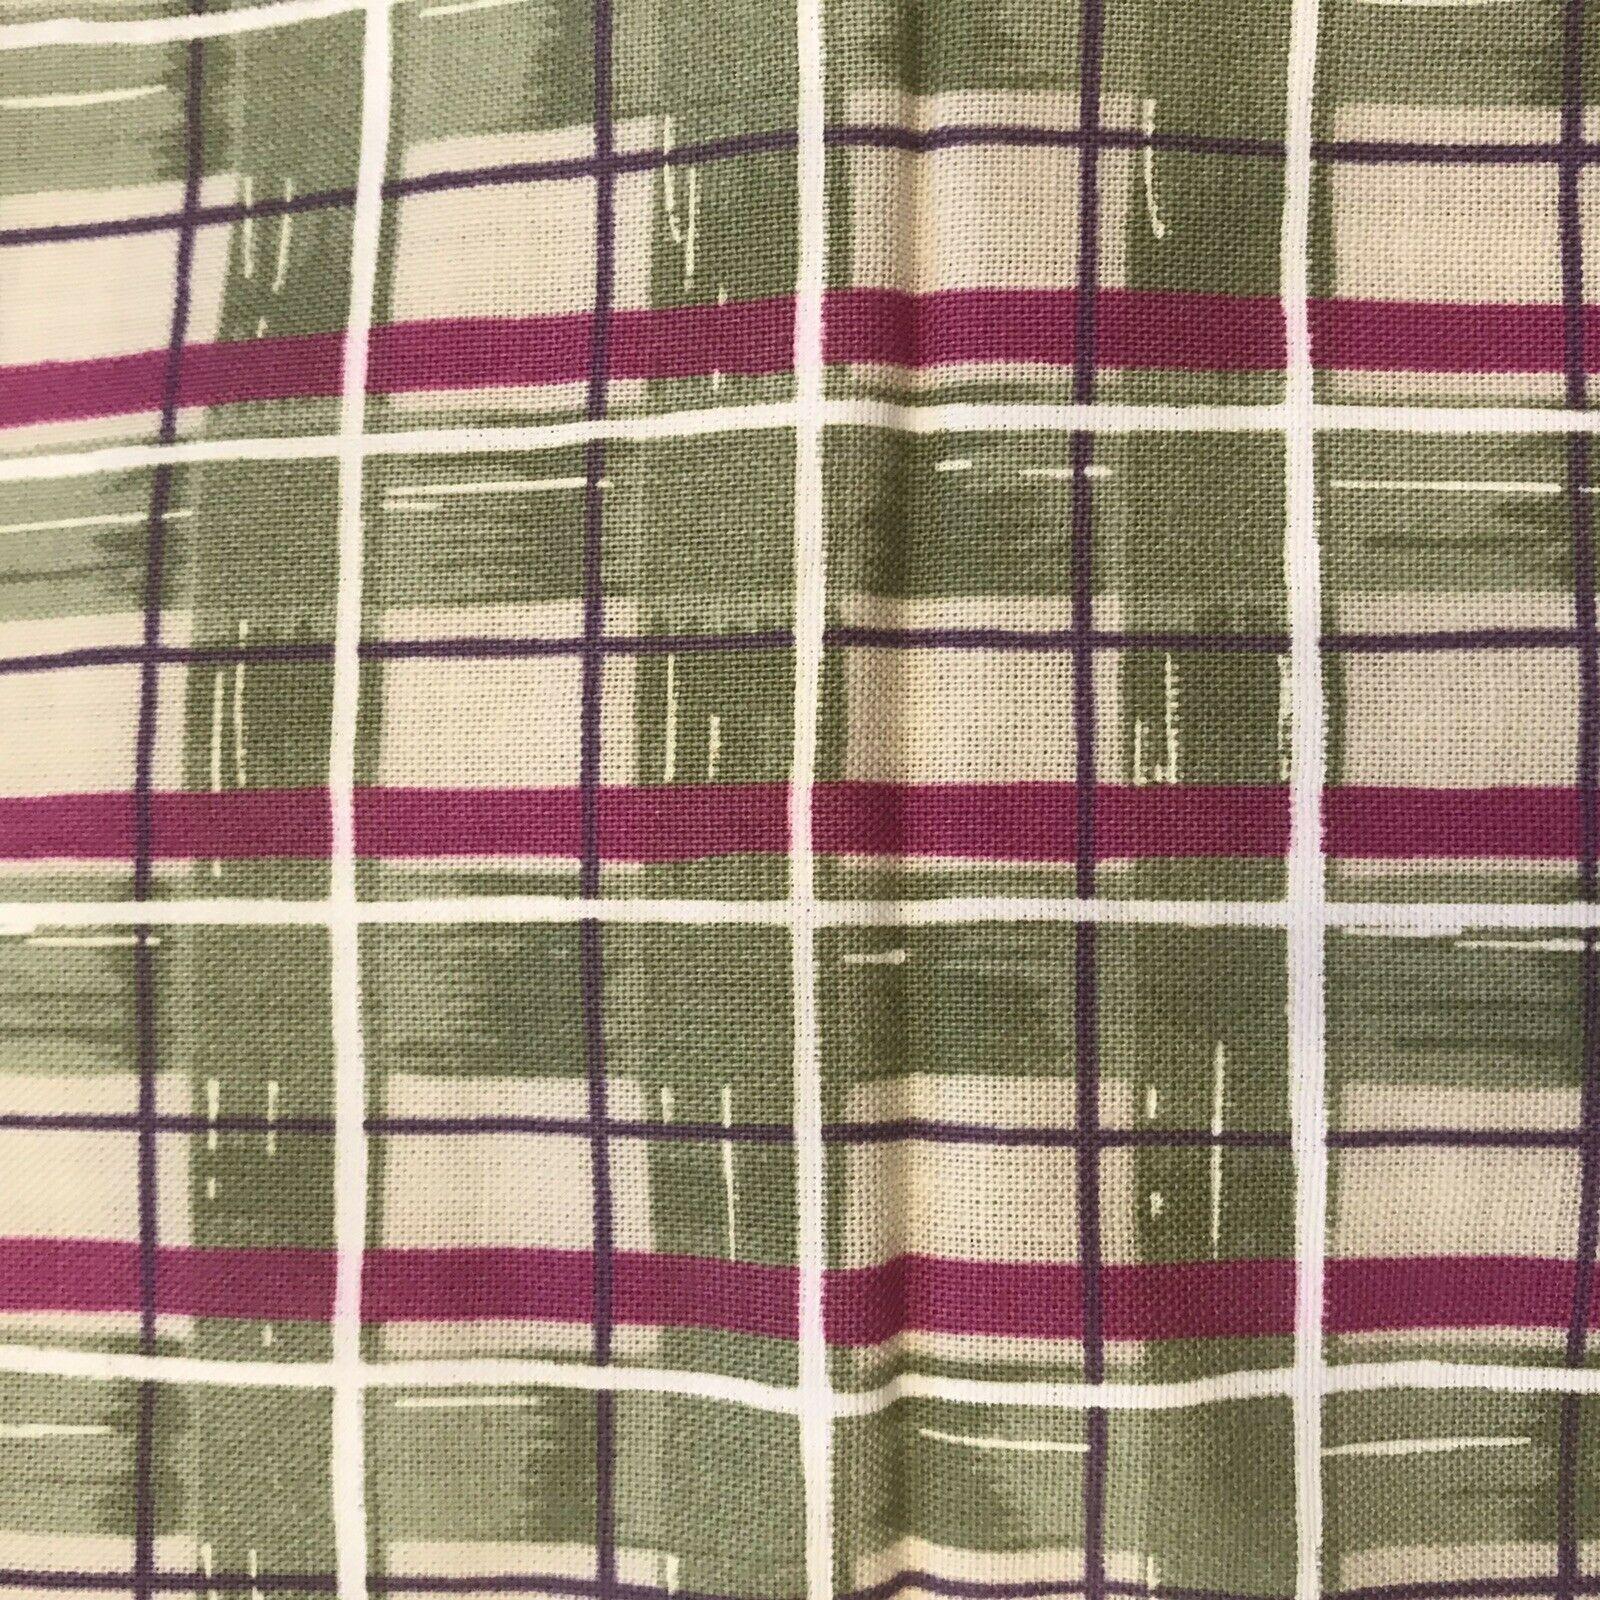 Daisy Kingdom Donna Dewberry Fabric Material Small Plaid Green Purple Springs - $9.28